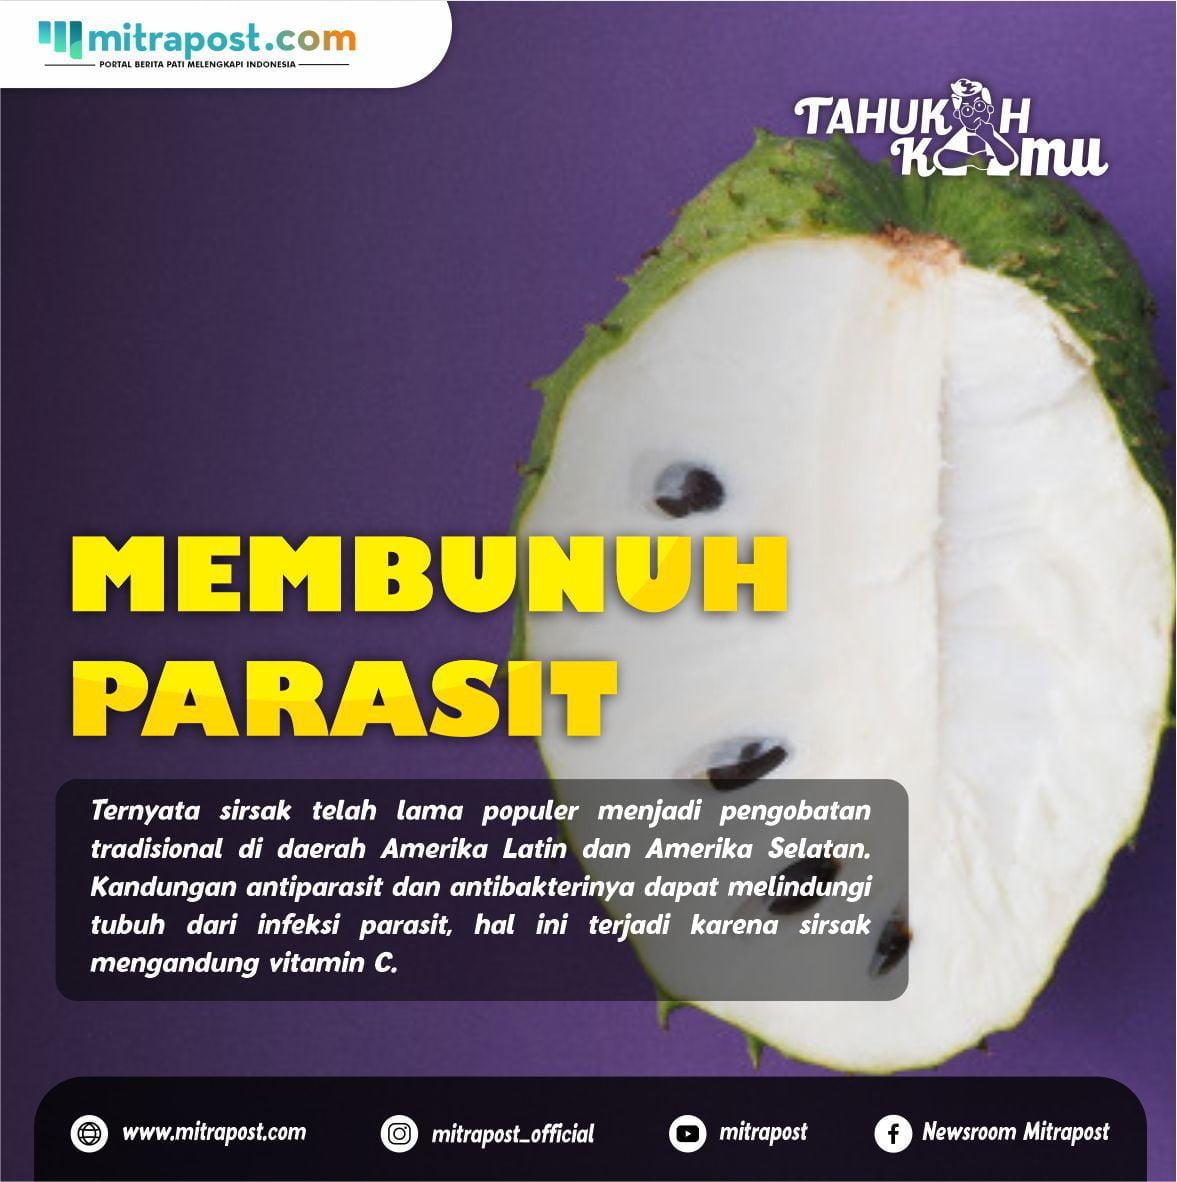 Manfaat buah sirsak untuk kesehatan tubuh